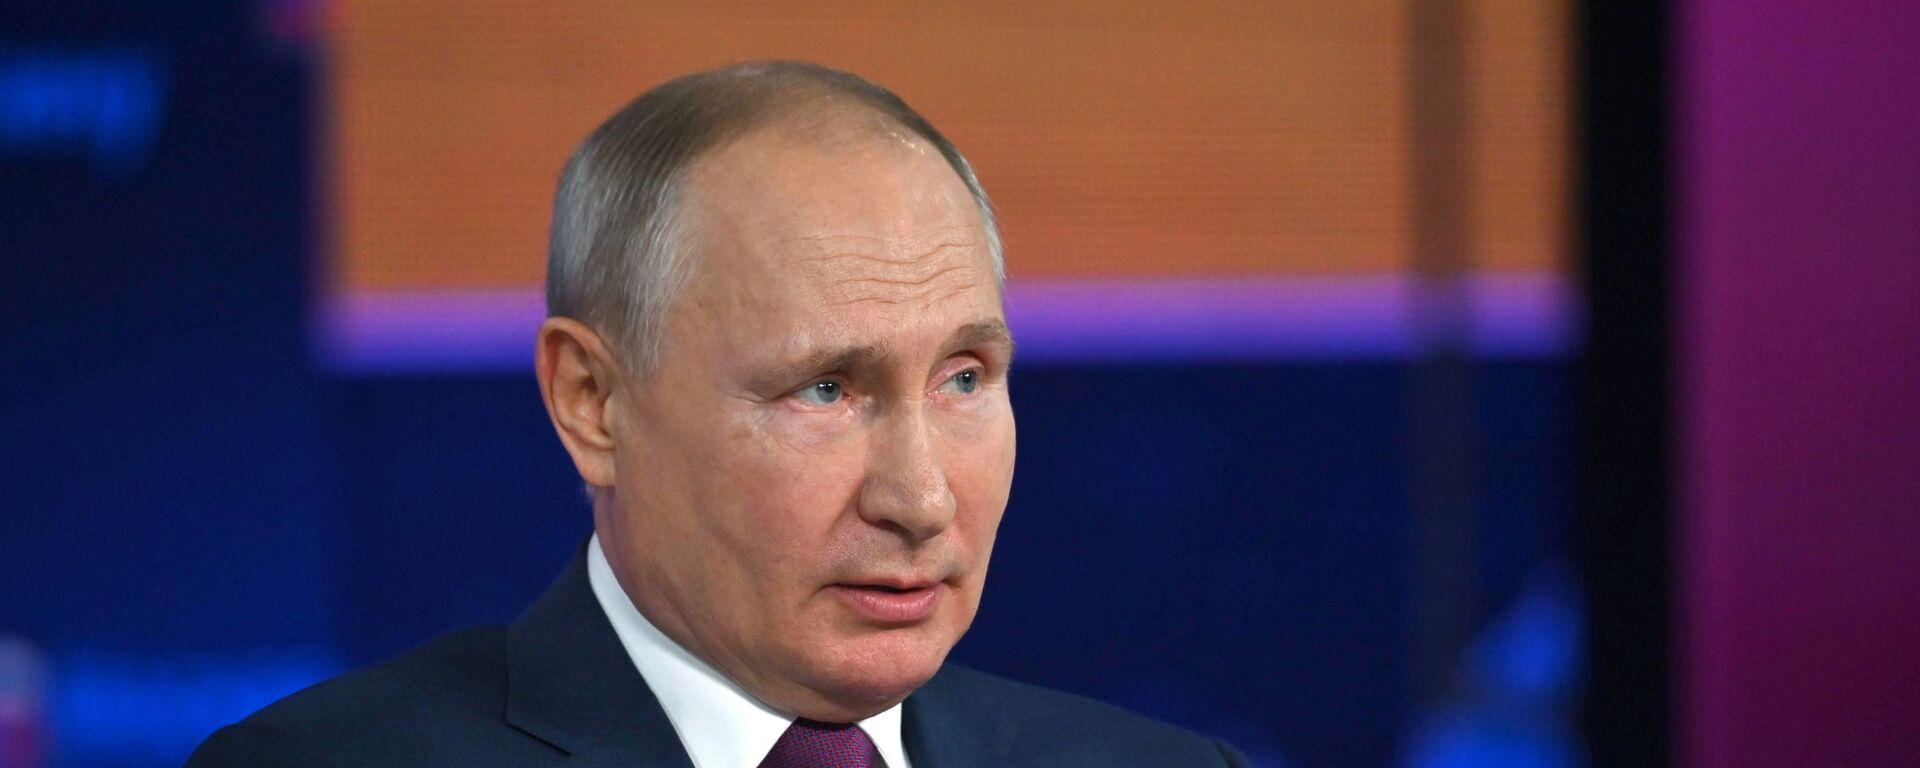 Ruski predsednik Vladimir Putin - Sputnik Srbija, 1920, 14.07.2021